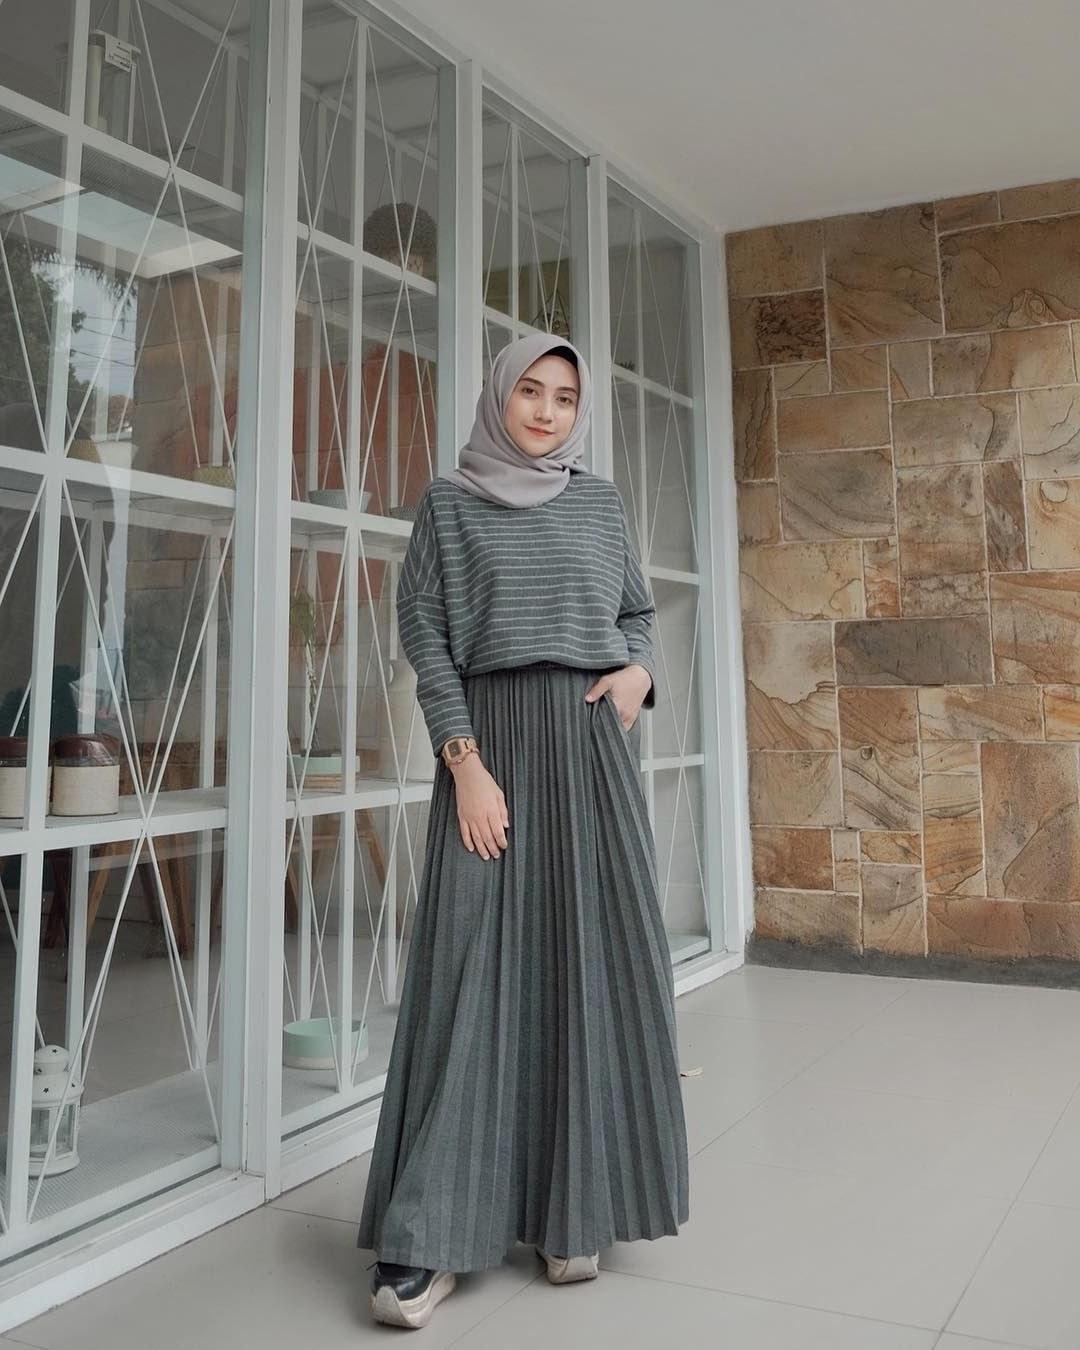 Design Baju Lebaran Terbaru 2019 Wddj Baju Muslim Lebaran Terbaru 2019 Dengan Gambar